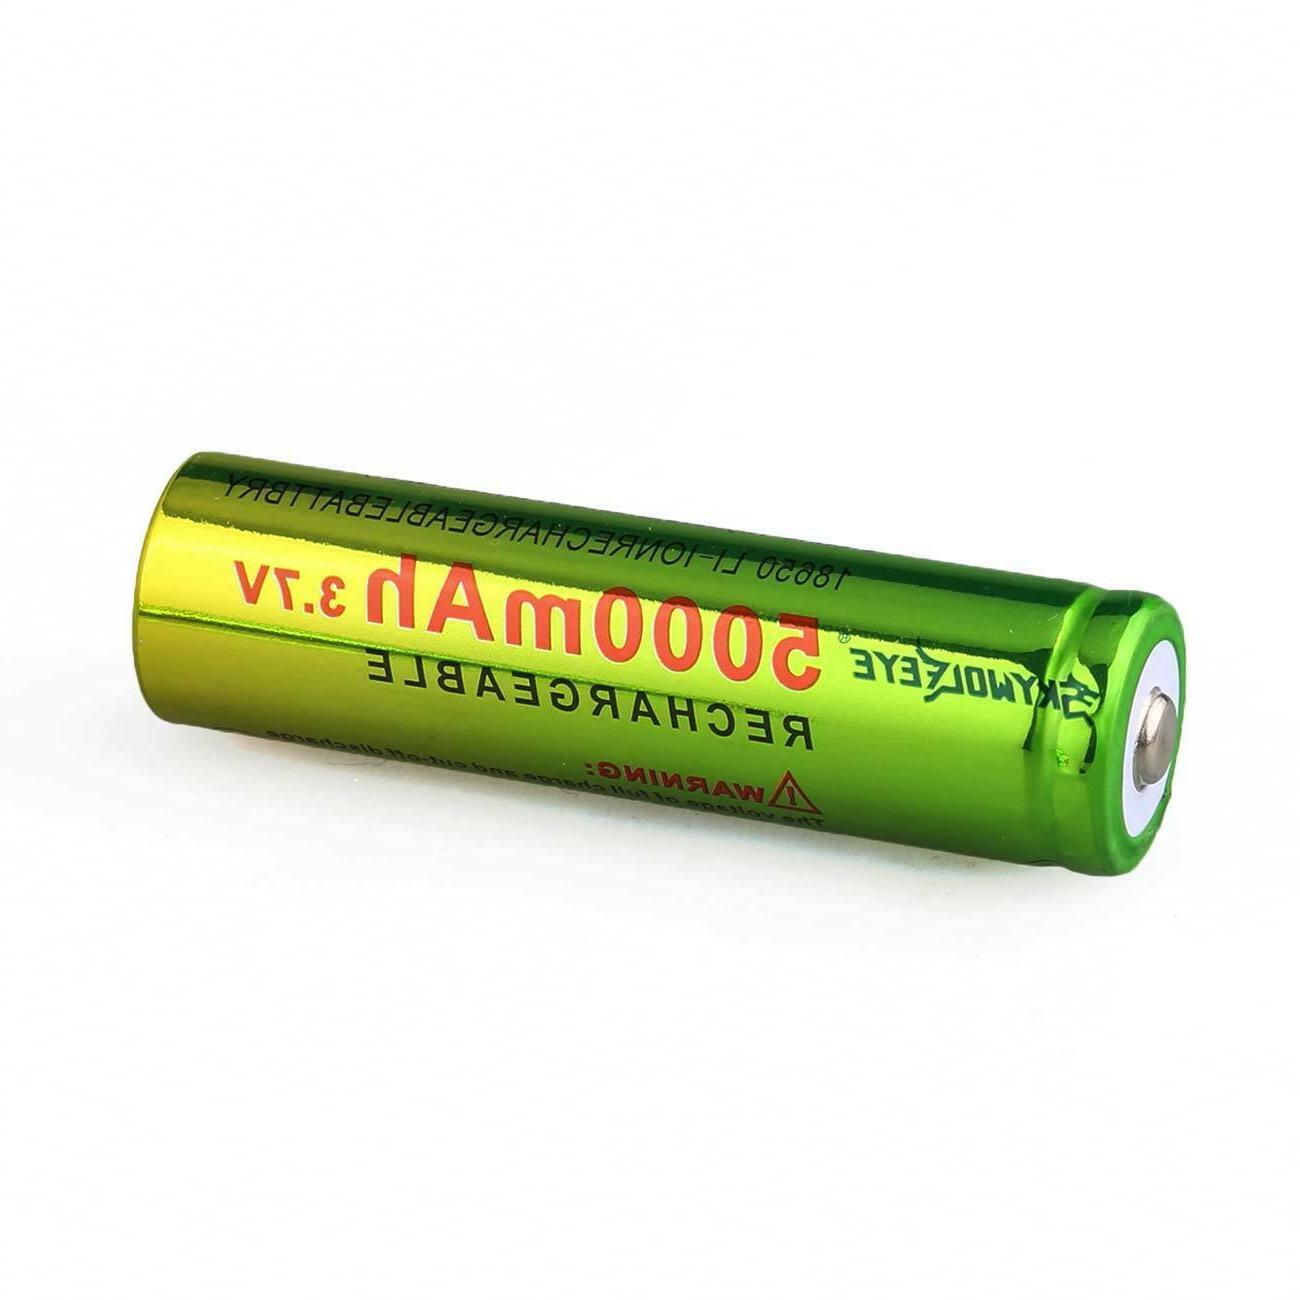 Lot 3.7V 18650 Li-ion Rechargeable Batteries